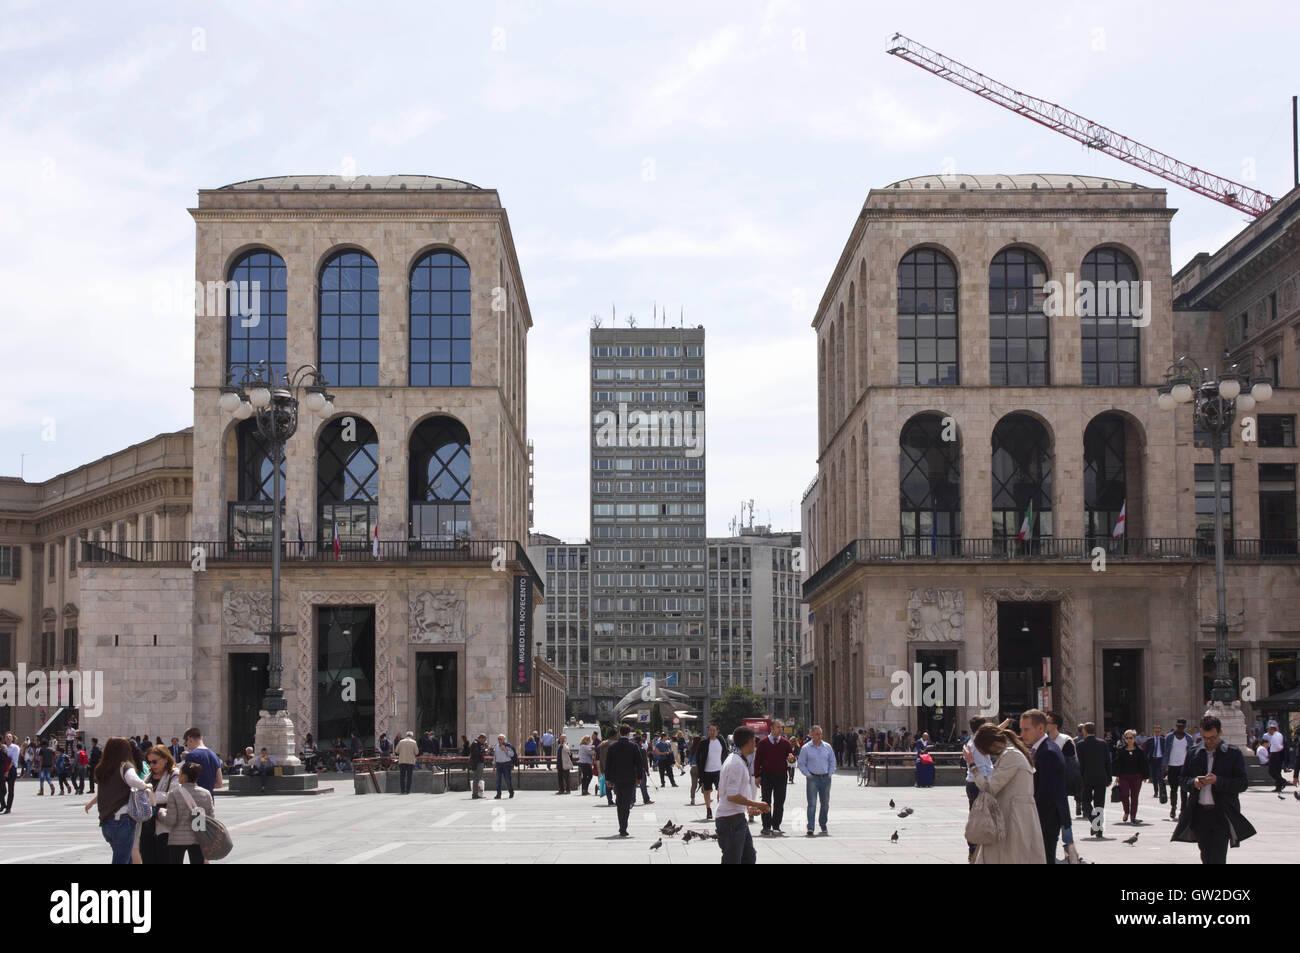 Museo Del 900 Milano.Milan Italy April 14 2015 View Of Piazza Diaz Skyscraper And